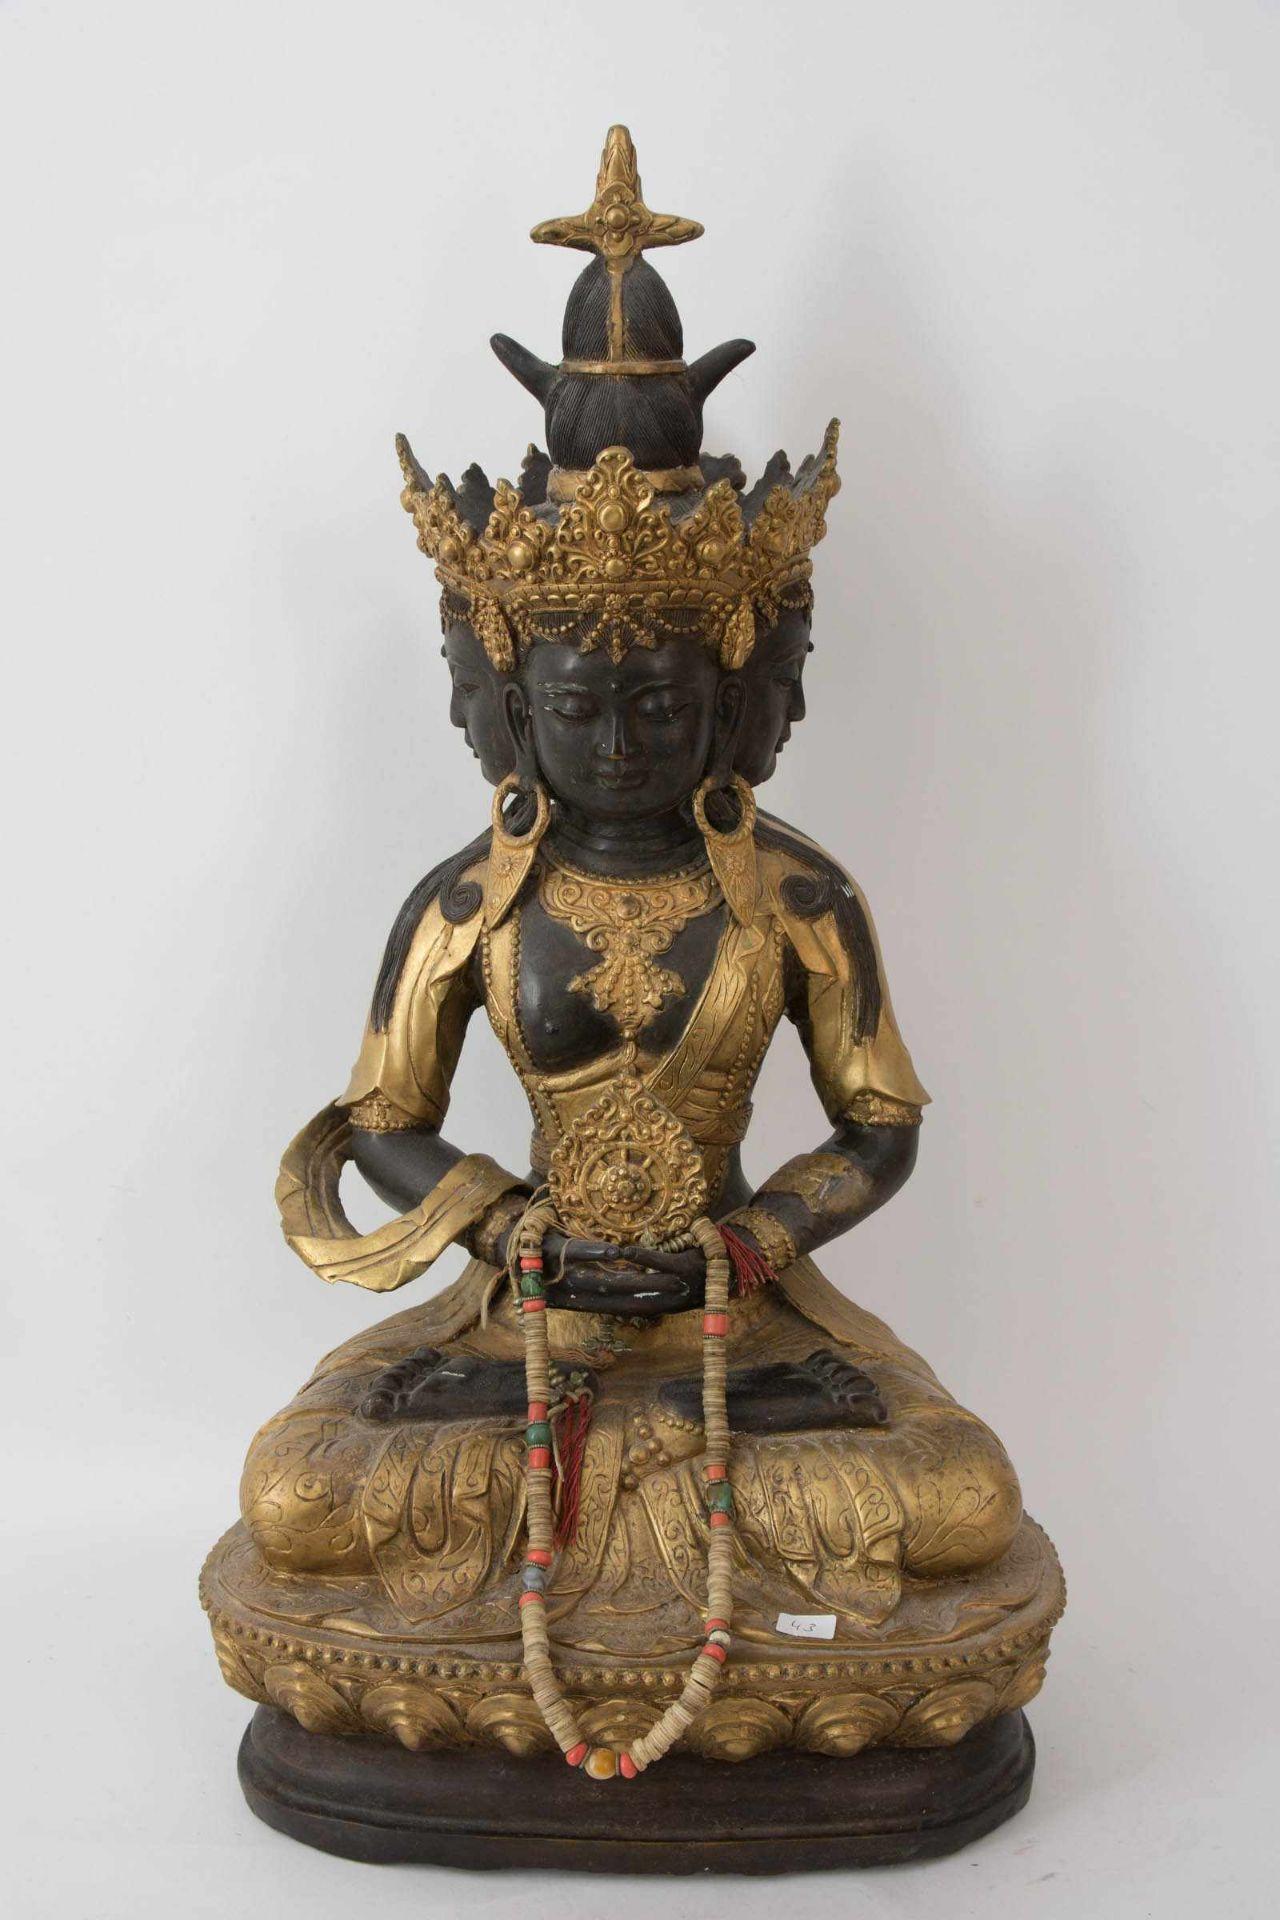 Los 6 - GUANYIN Statuette,vergoldet, Ostasien 20. Jahrhundert. Teils goldfarbig bemalte Statuette der